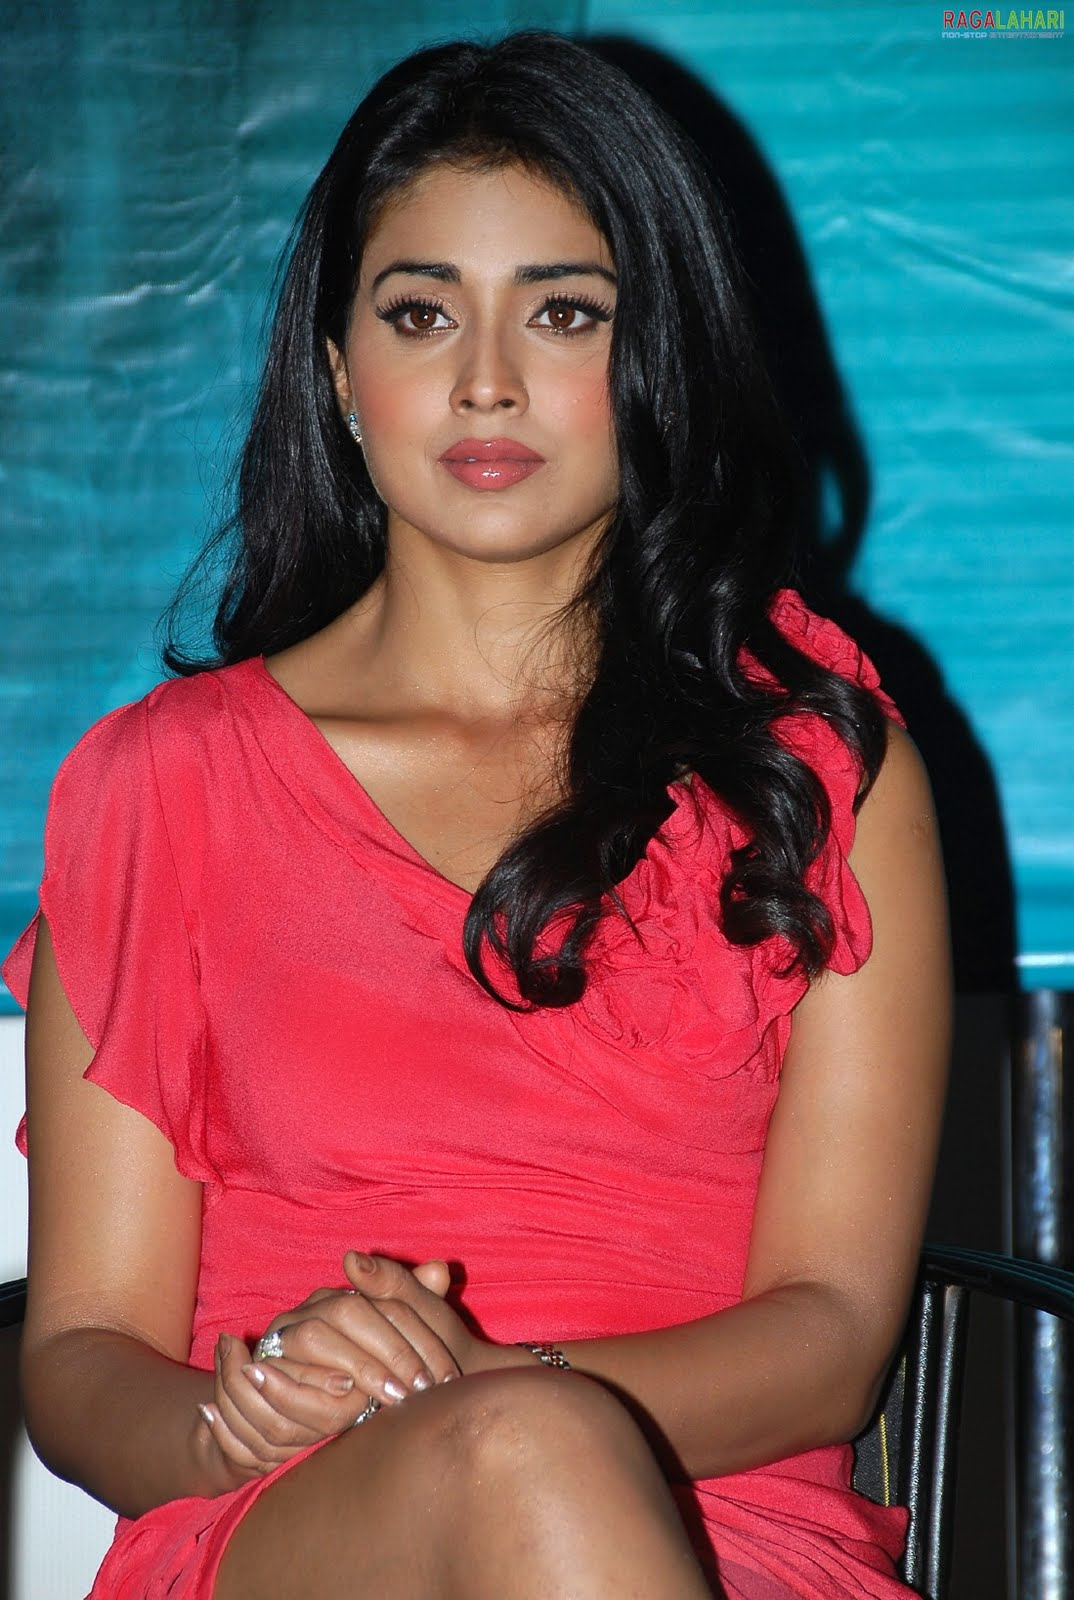 Bold Sonal Chauhan in red bikini 3G 4276019 - girlietalk info